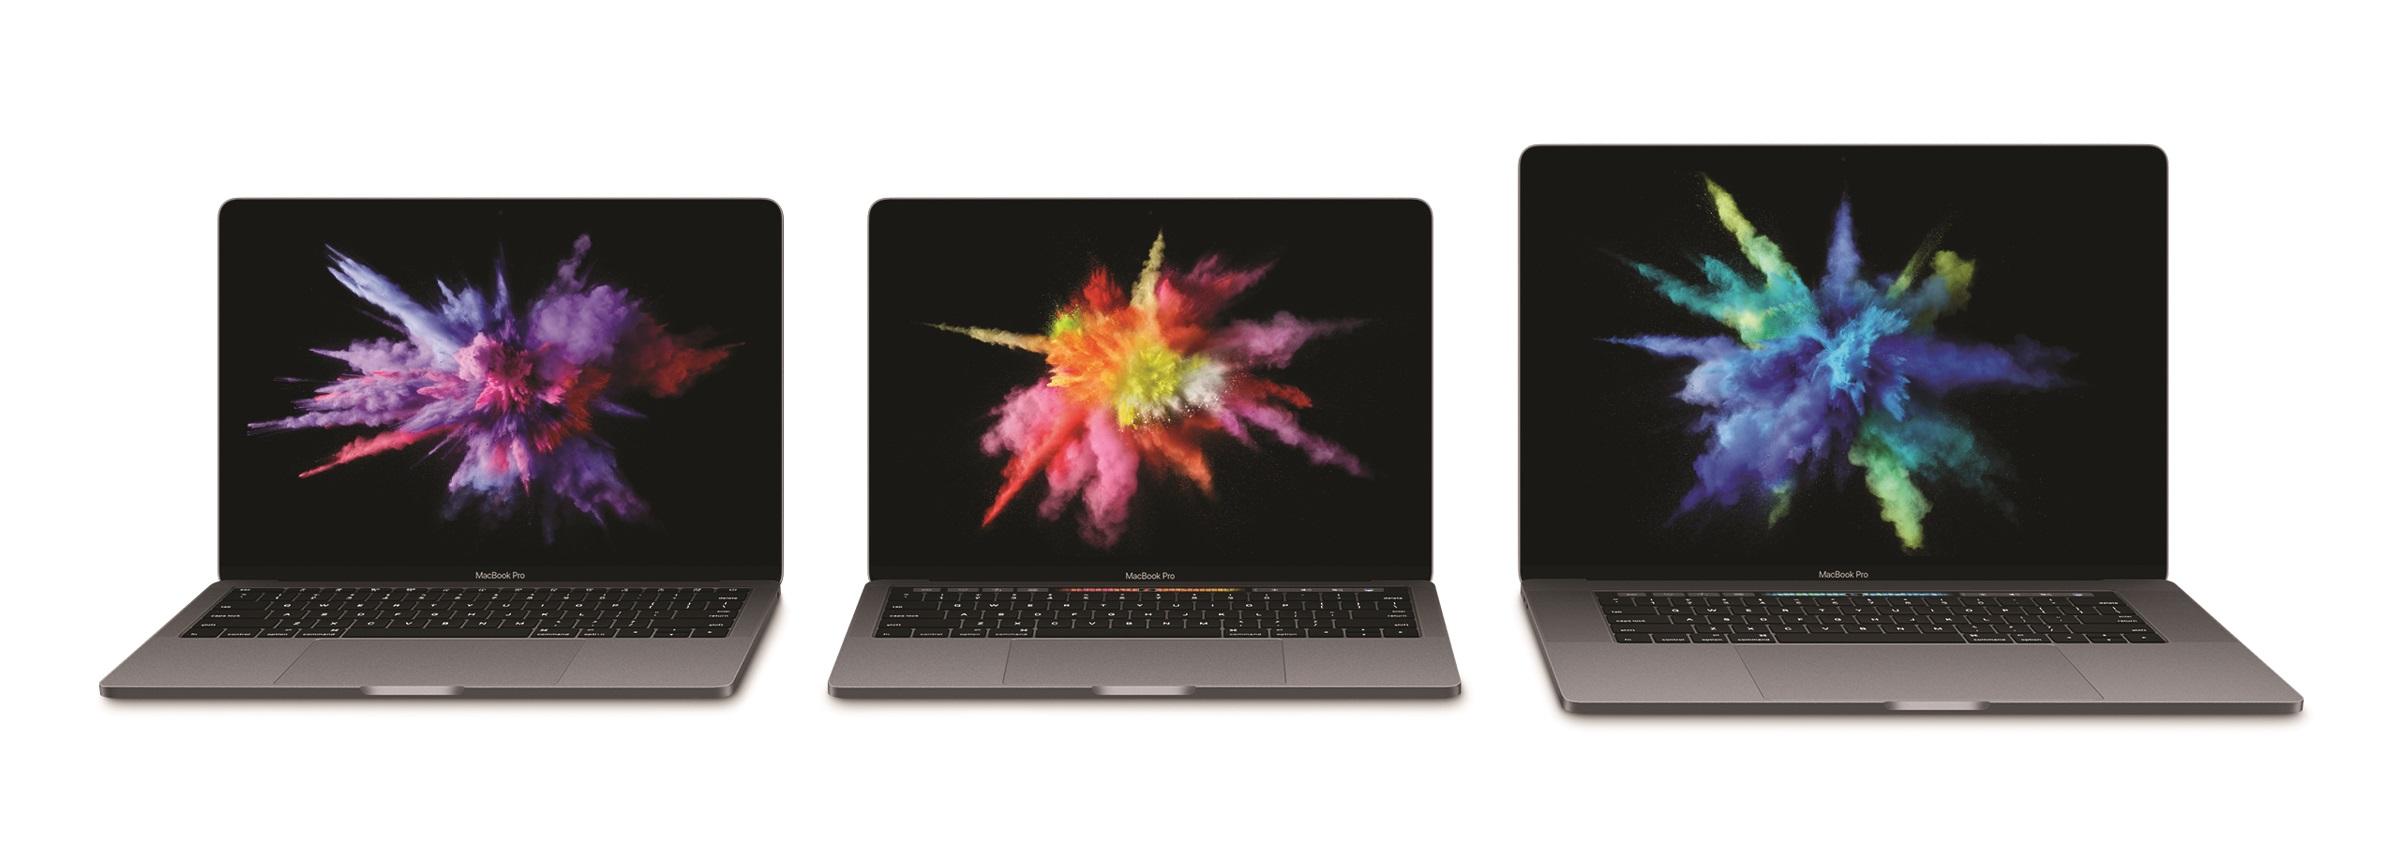 Apple MacBook Pro 15: Radikal abgespeckter Primus